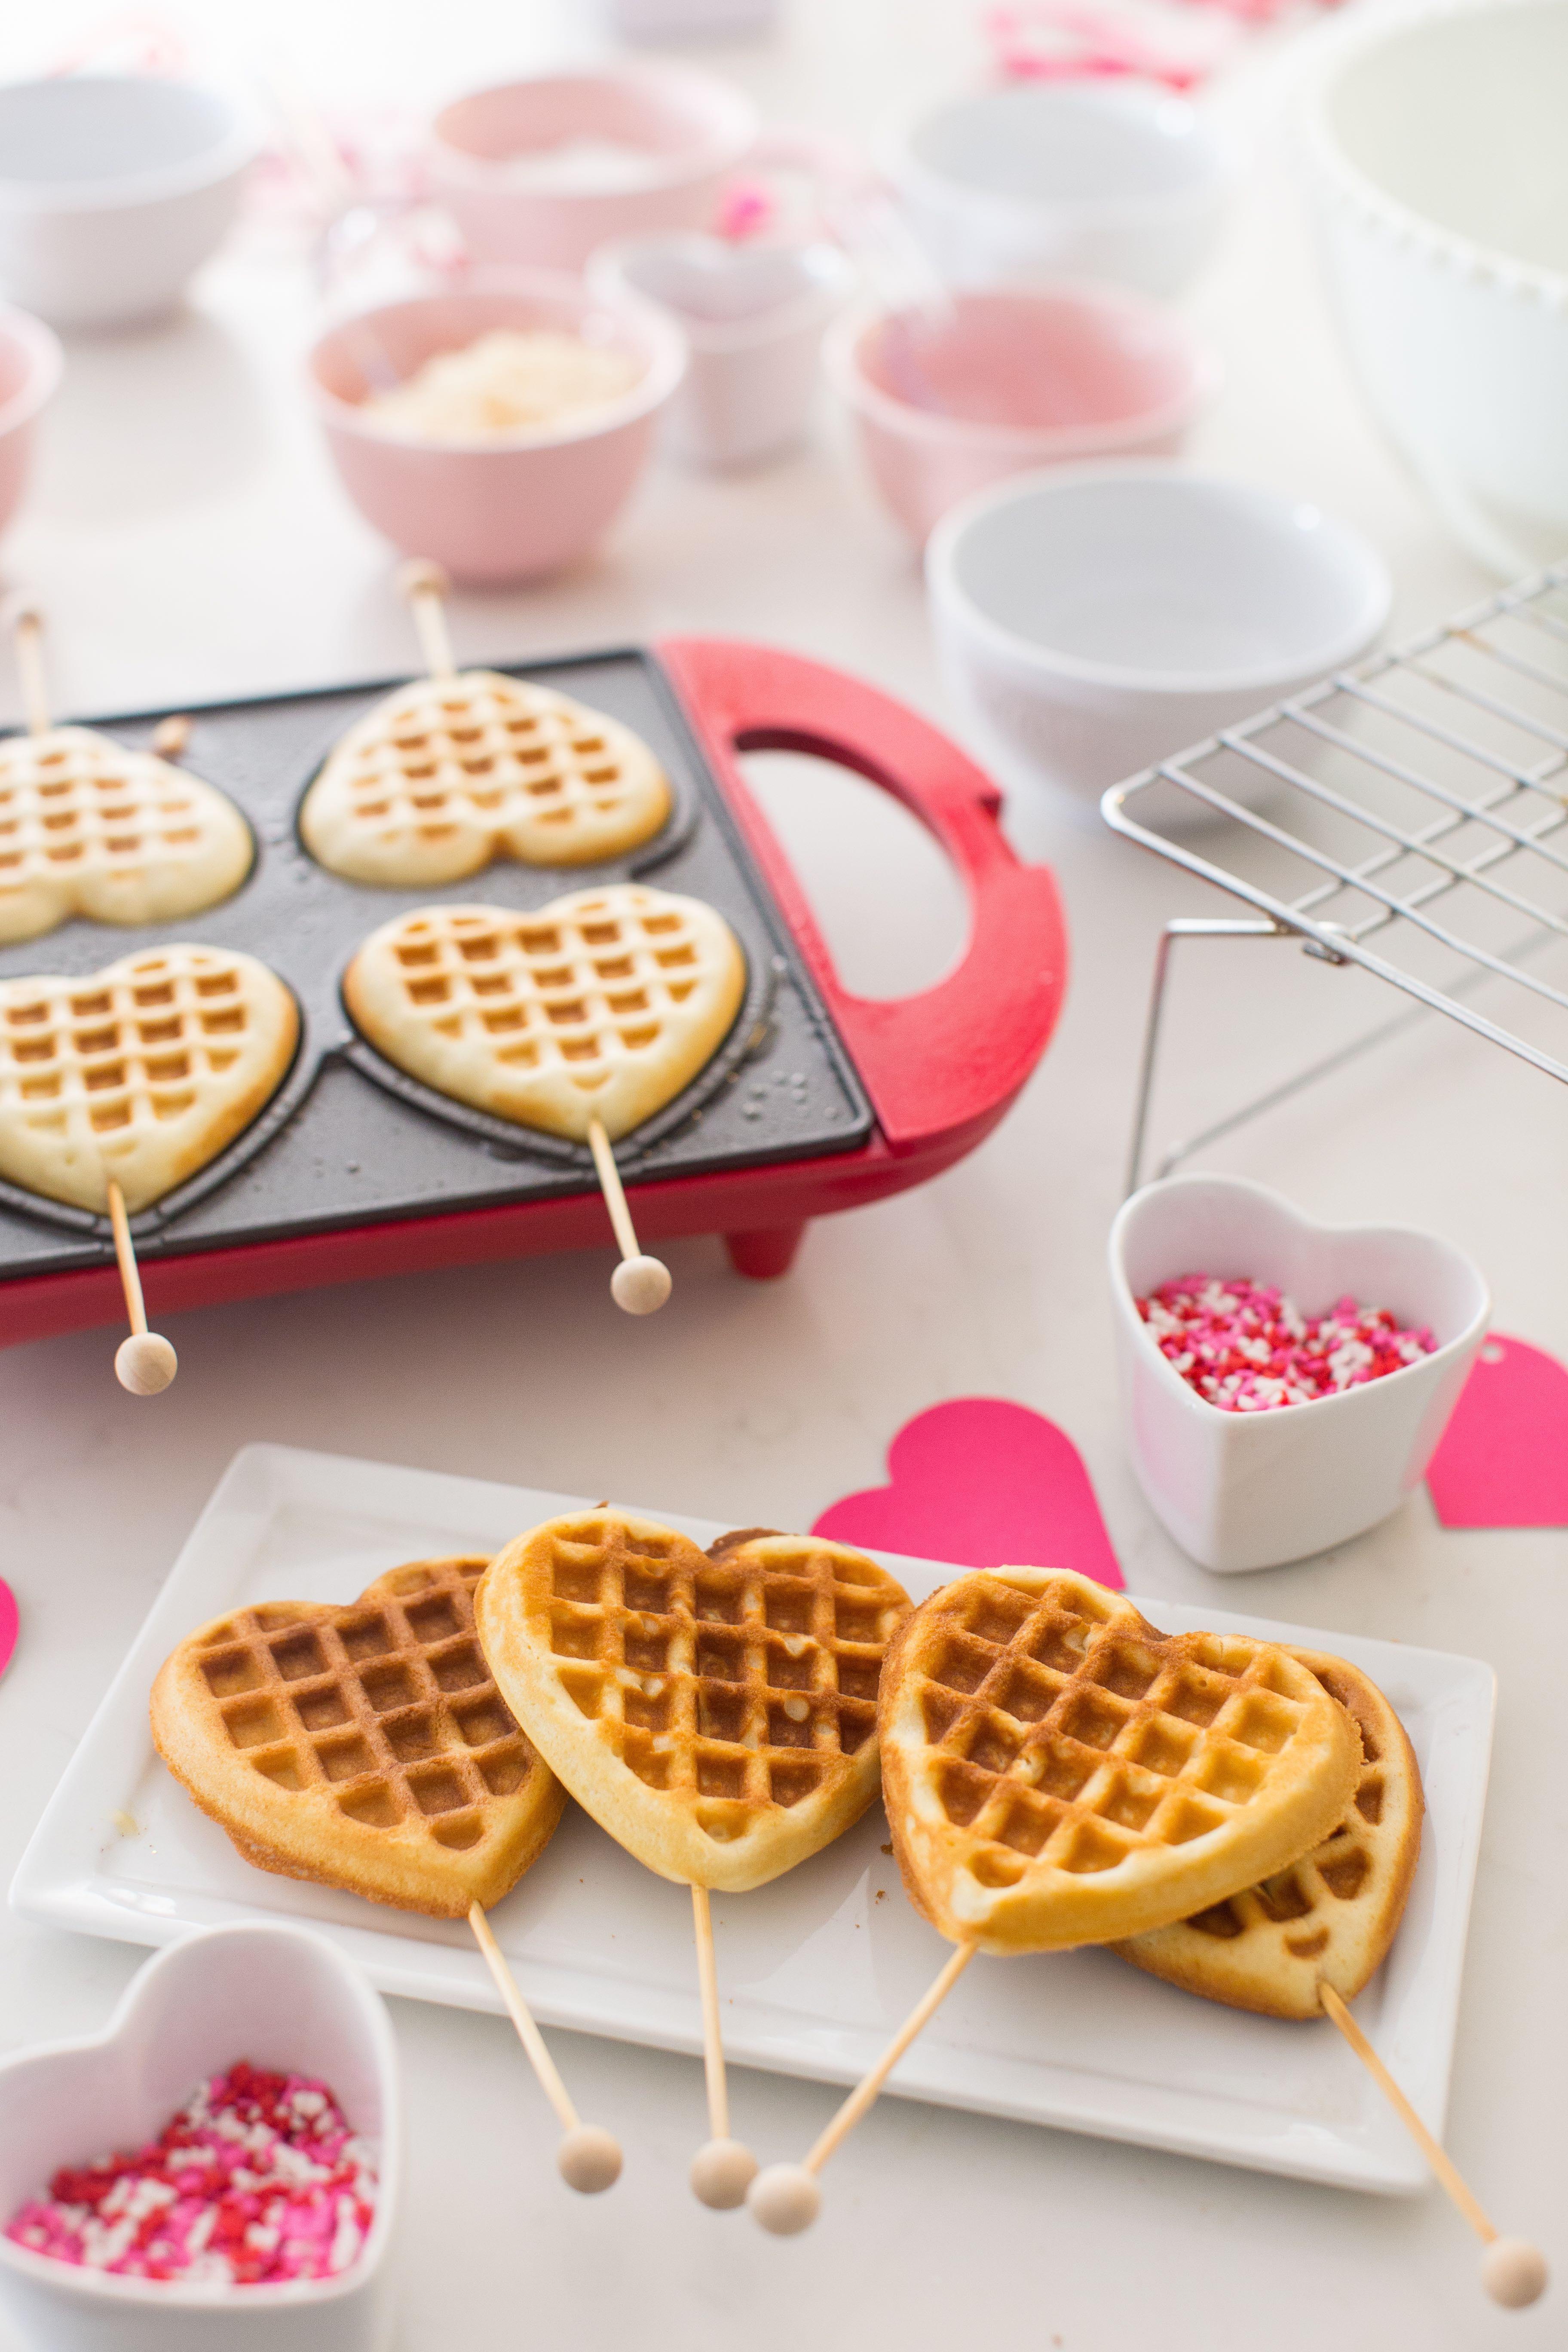 Valentines Heart Shaped Waffles Just Destiny 7 Resize